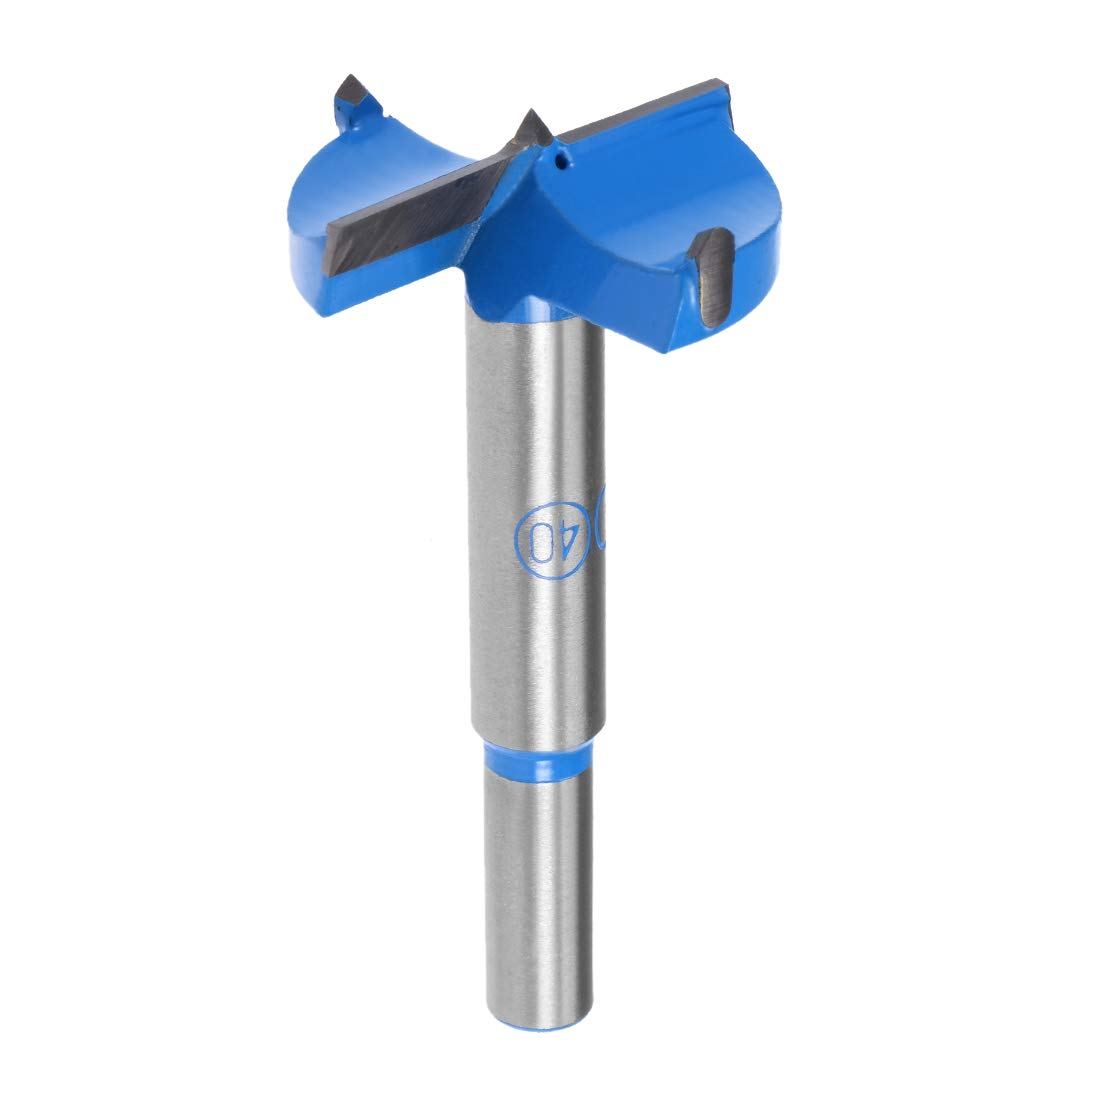 Sourcingmap Carbide Hinge Boring Forstner Drill Bit, 19mm Diameter, 7mm Shank sourcing map